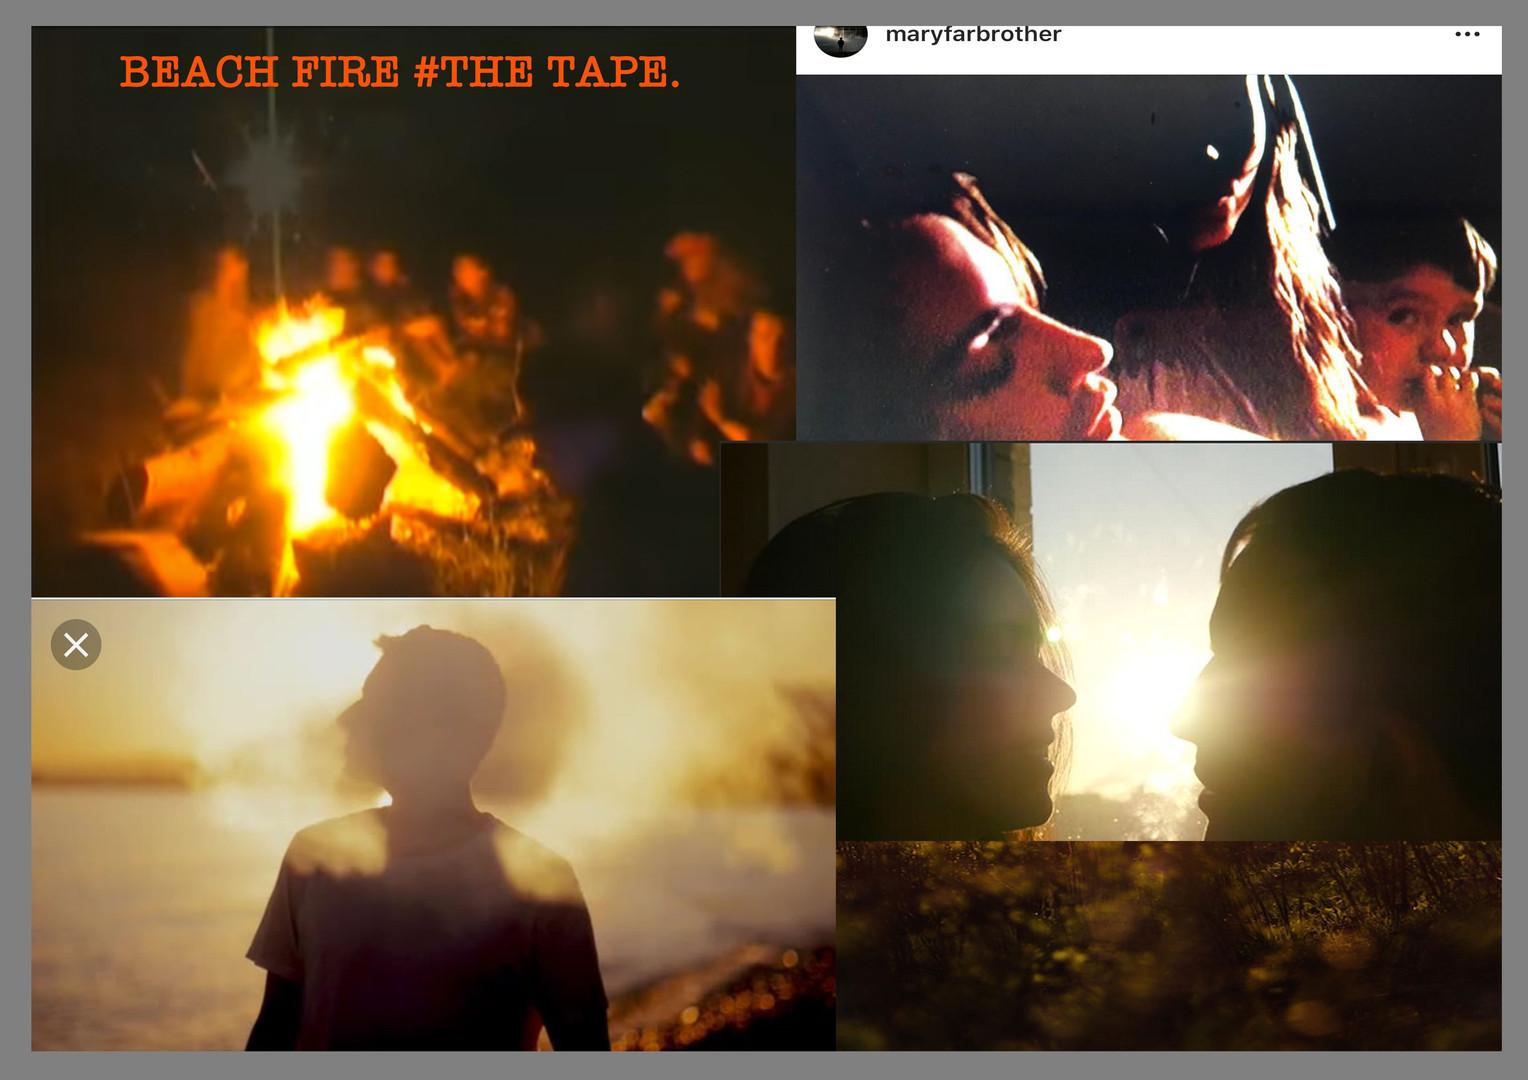 BEACH FIRE # THE TAPE.jpg